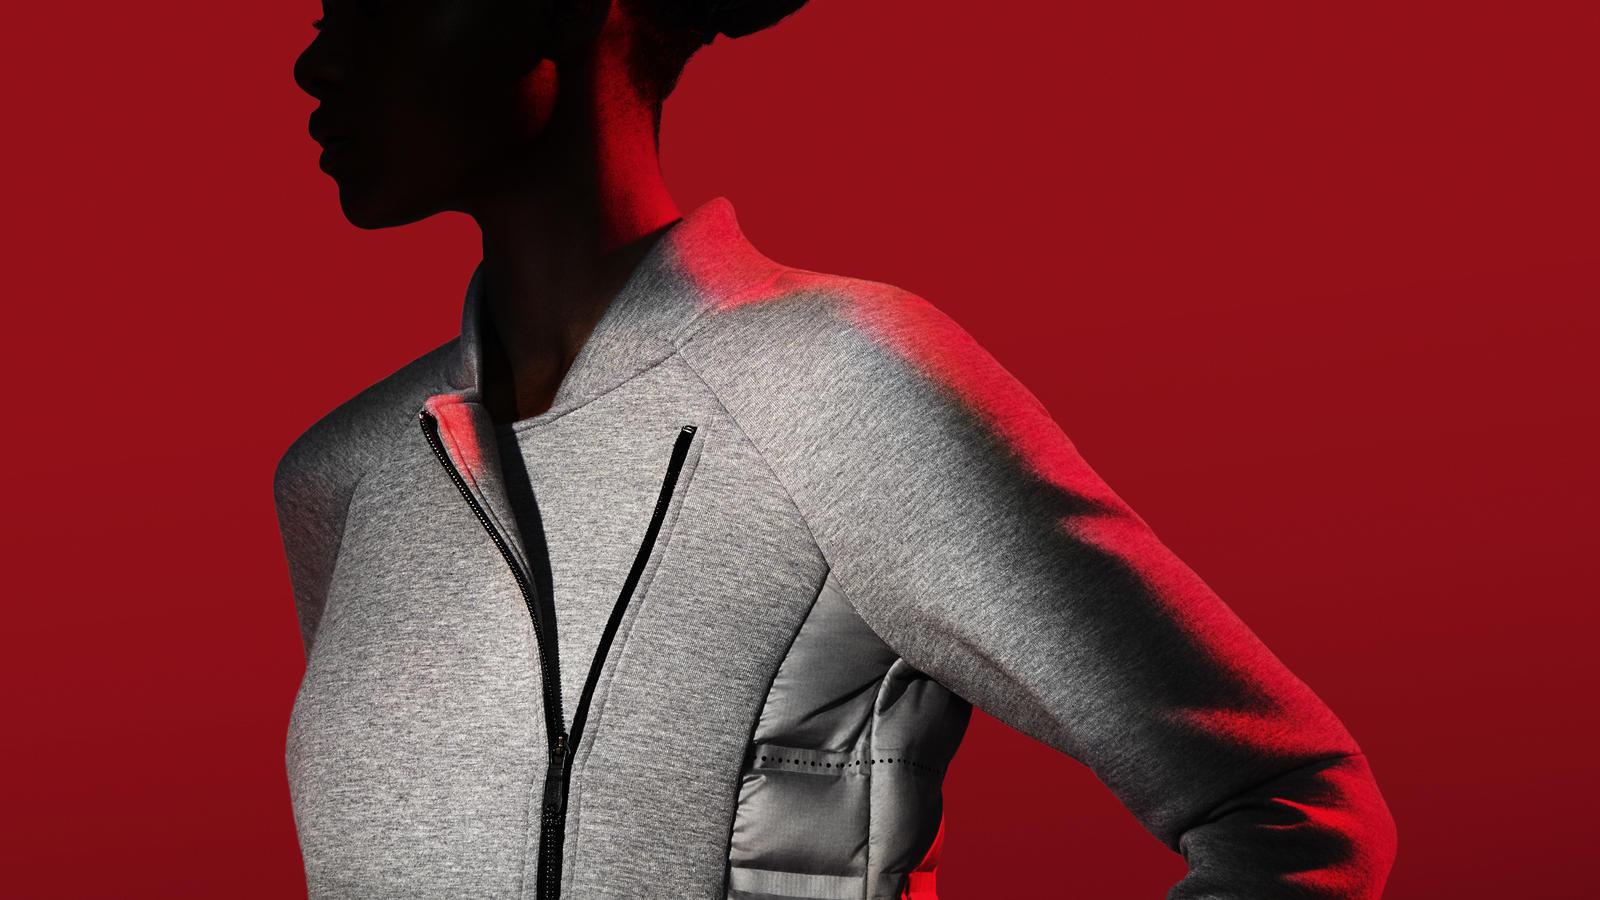 The Look of Winter: The 2015 Nike Tech Fleece Aeroloft